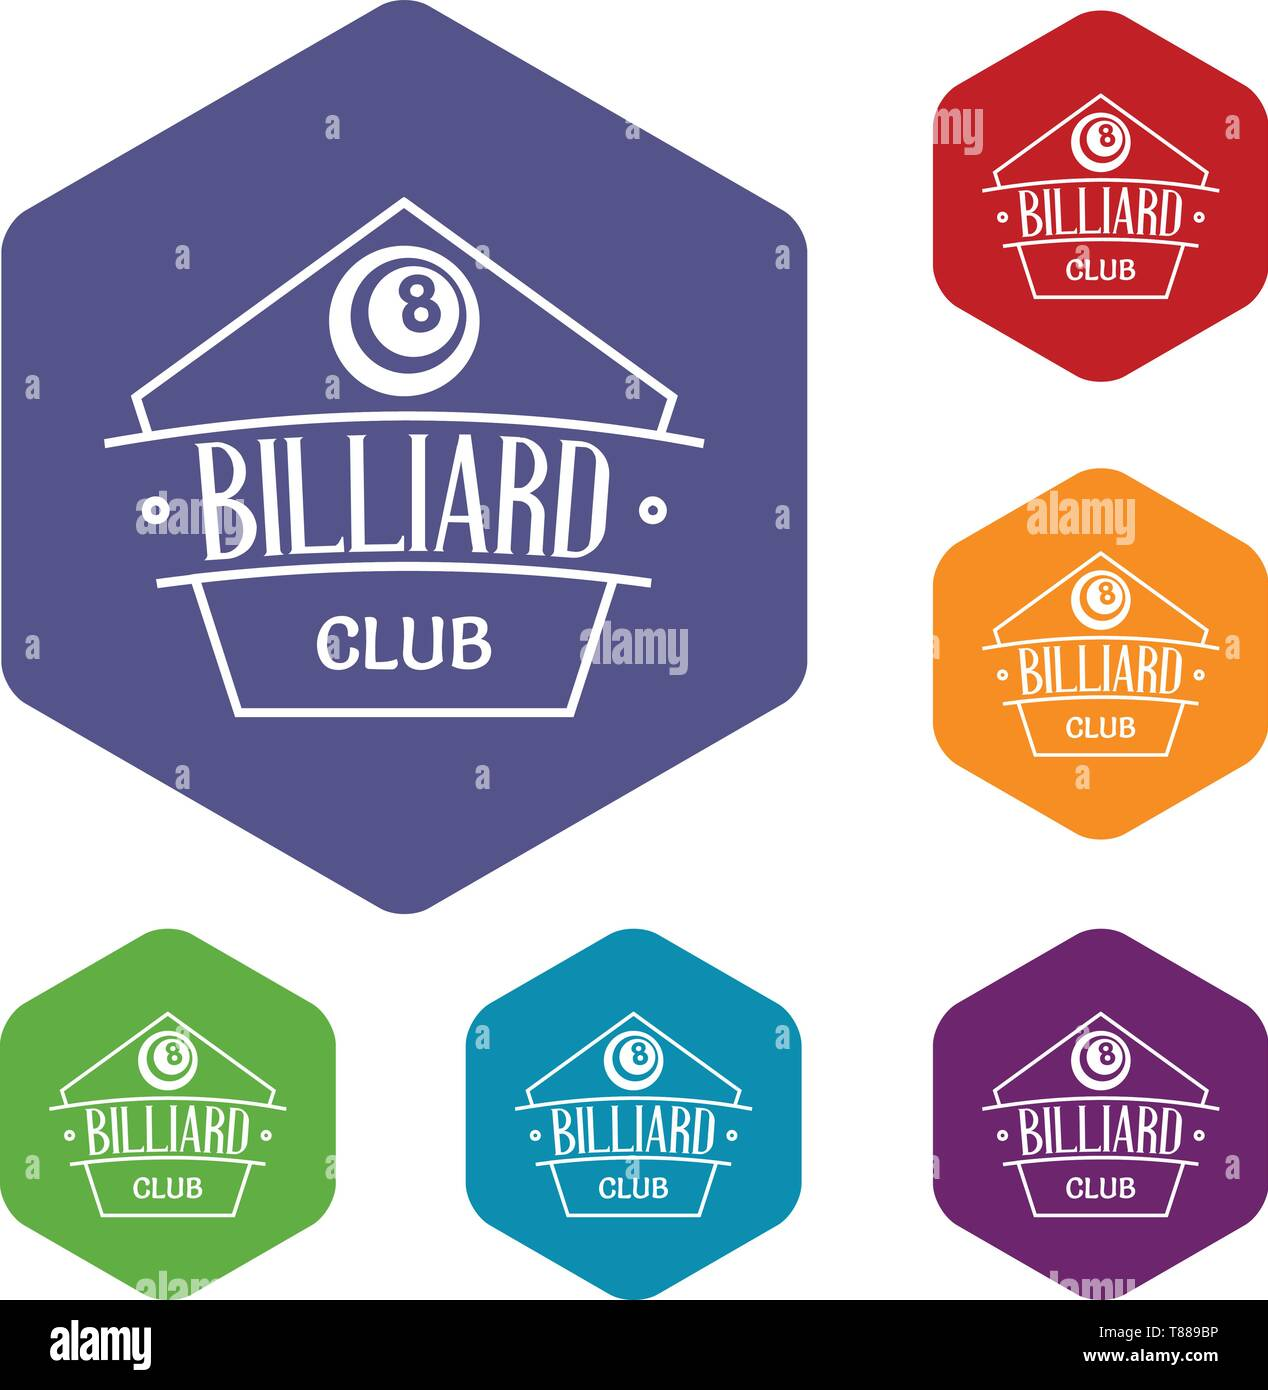 Billiard icons vector hexahedron - Stock Image